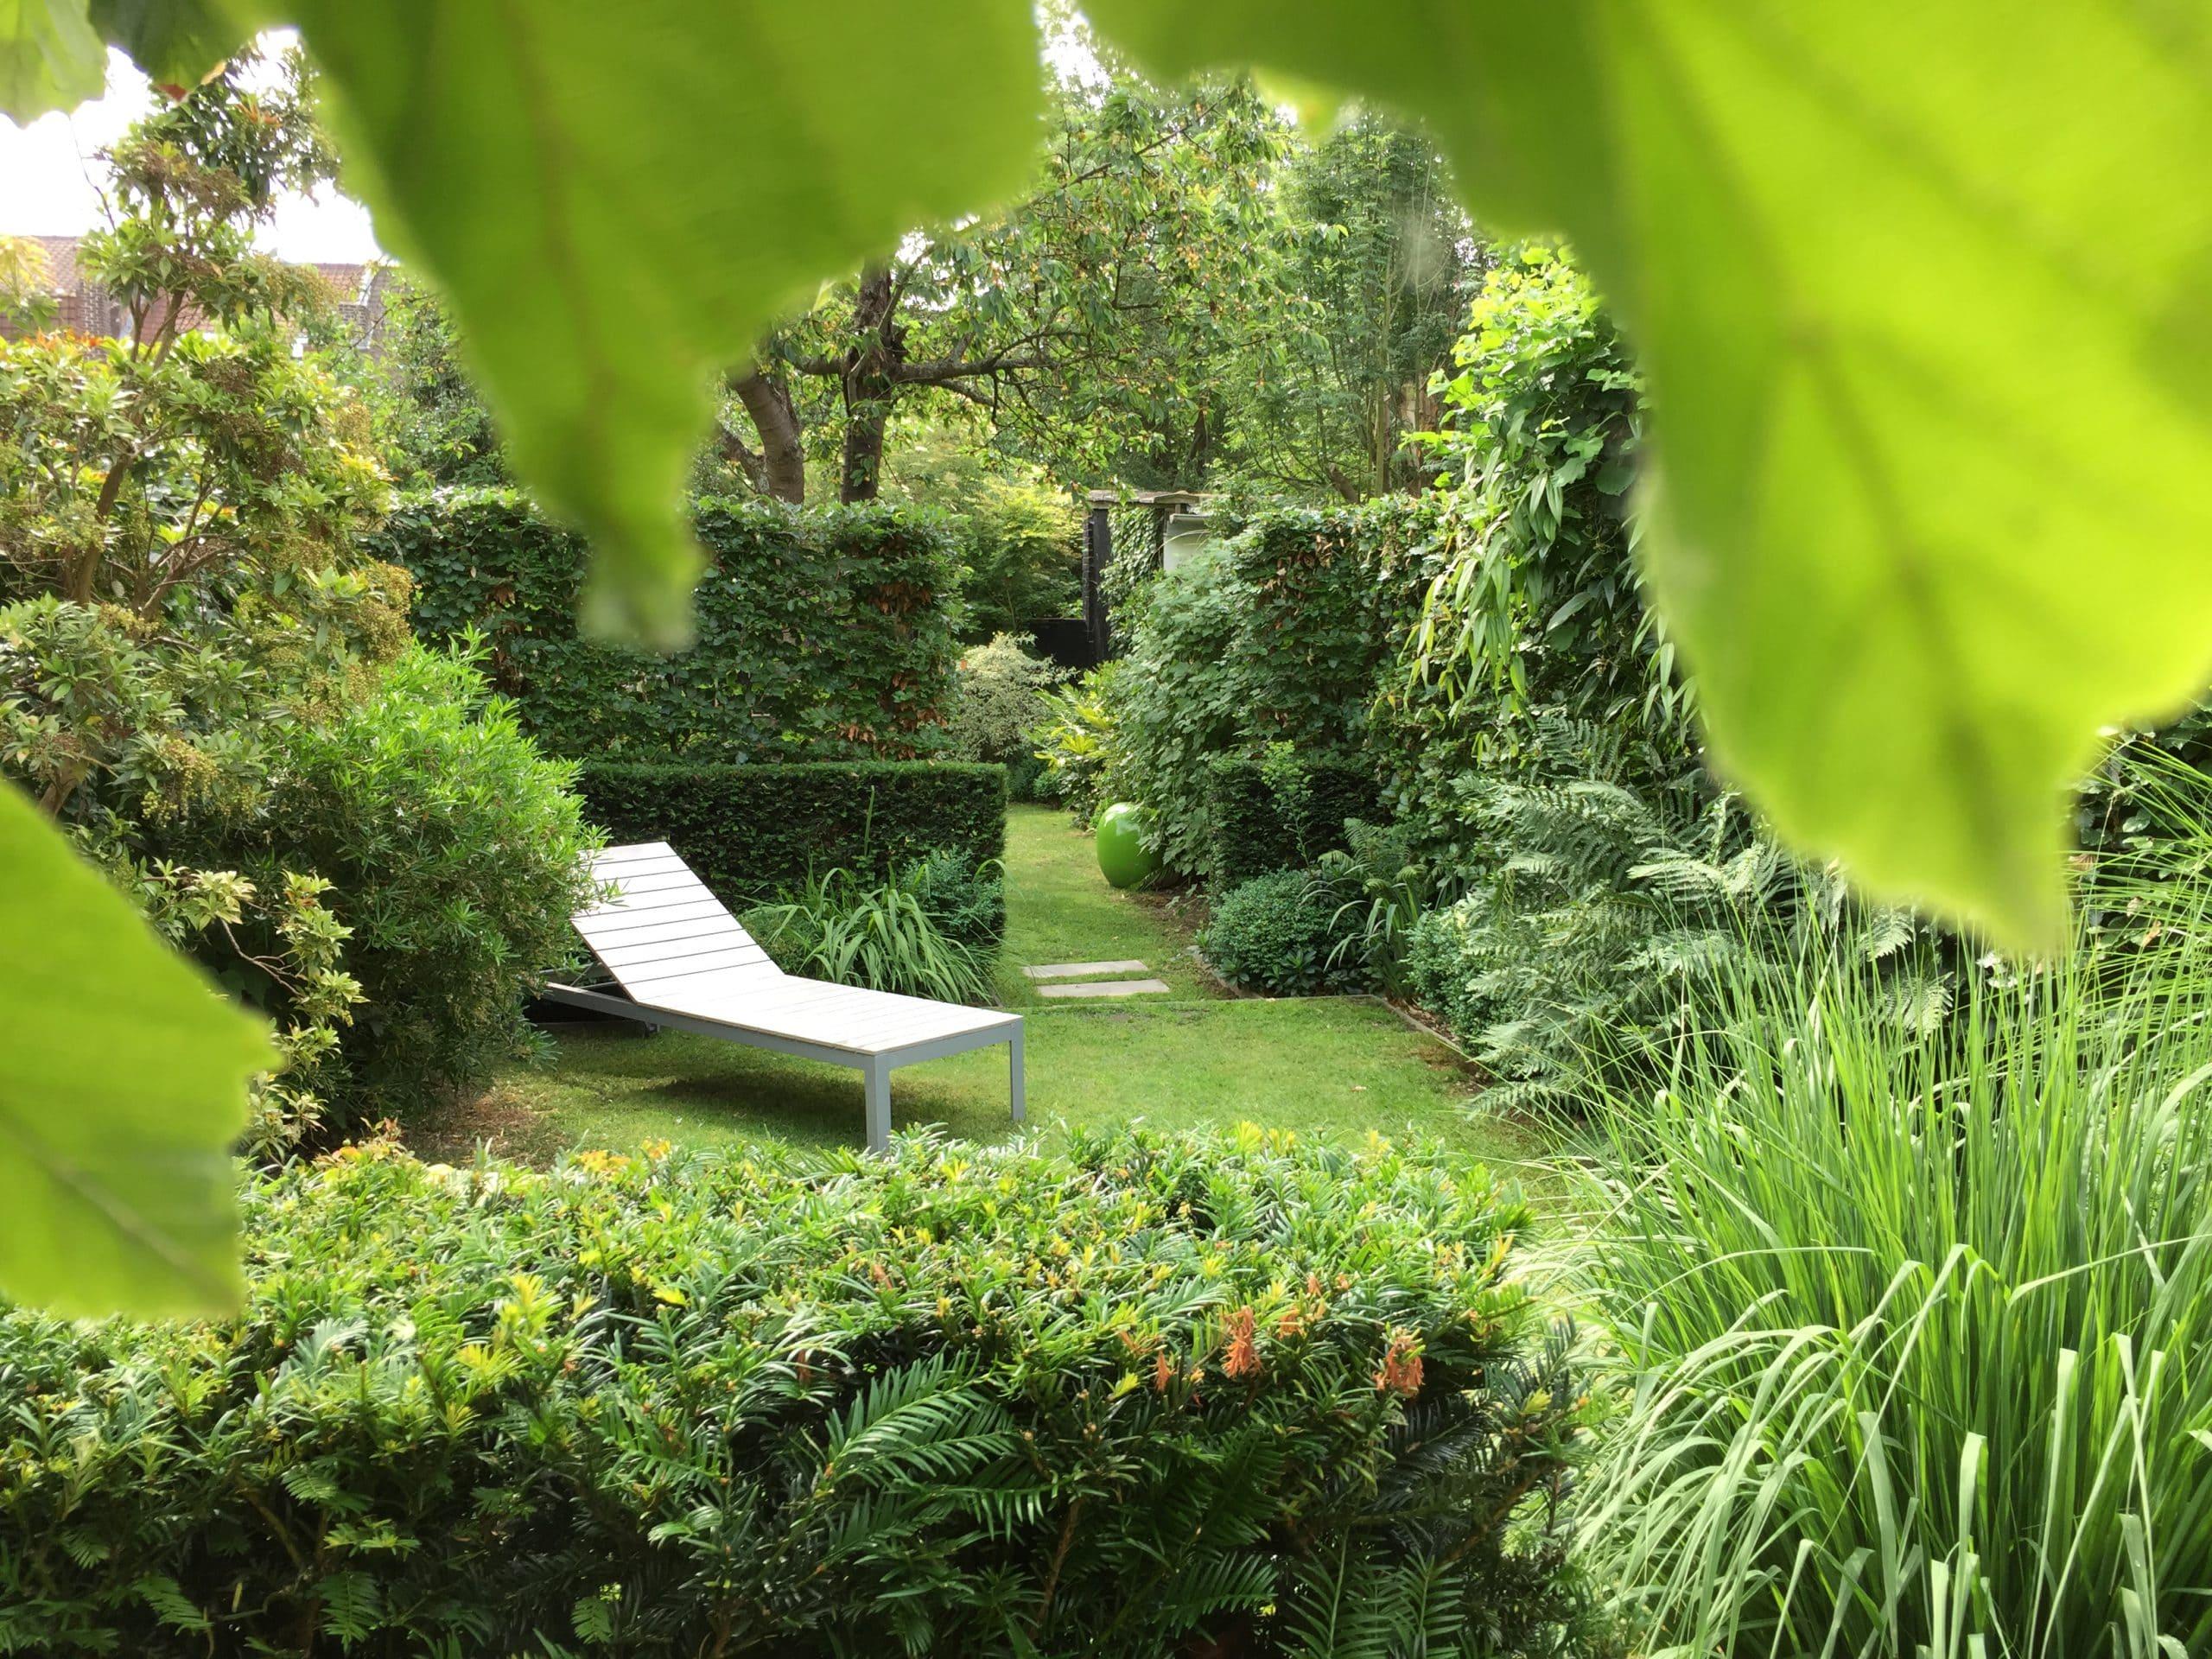 Entretien am nagement paysager lille home ext rieur for Amenagement jardin finistere nord